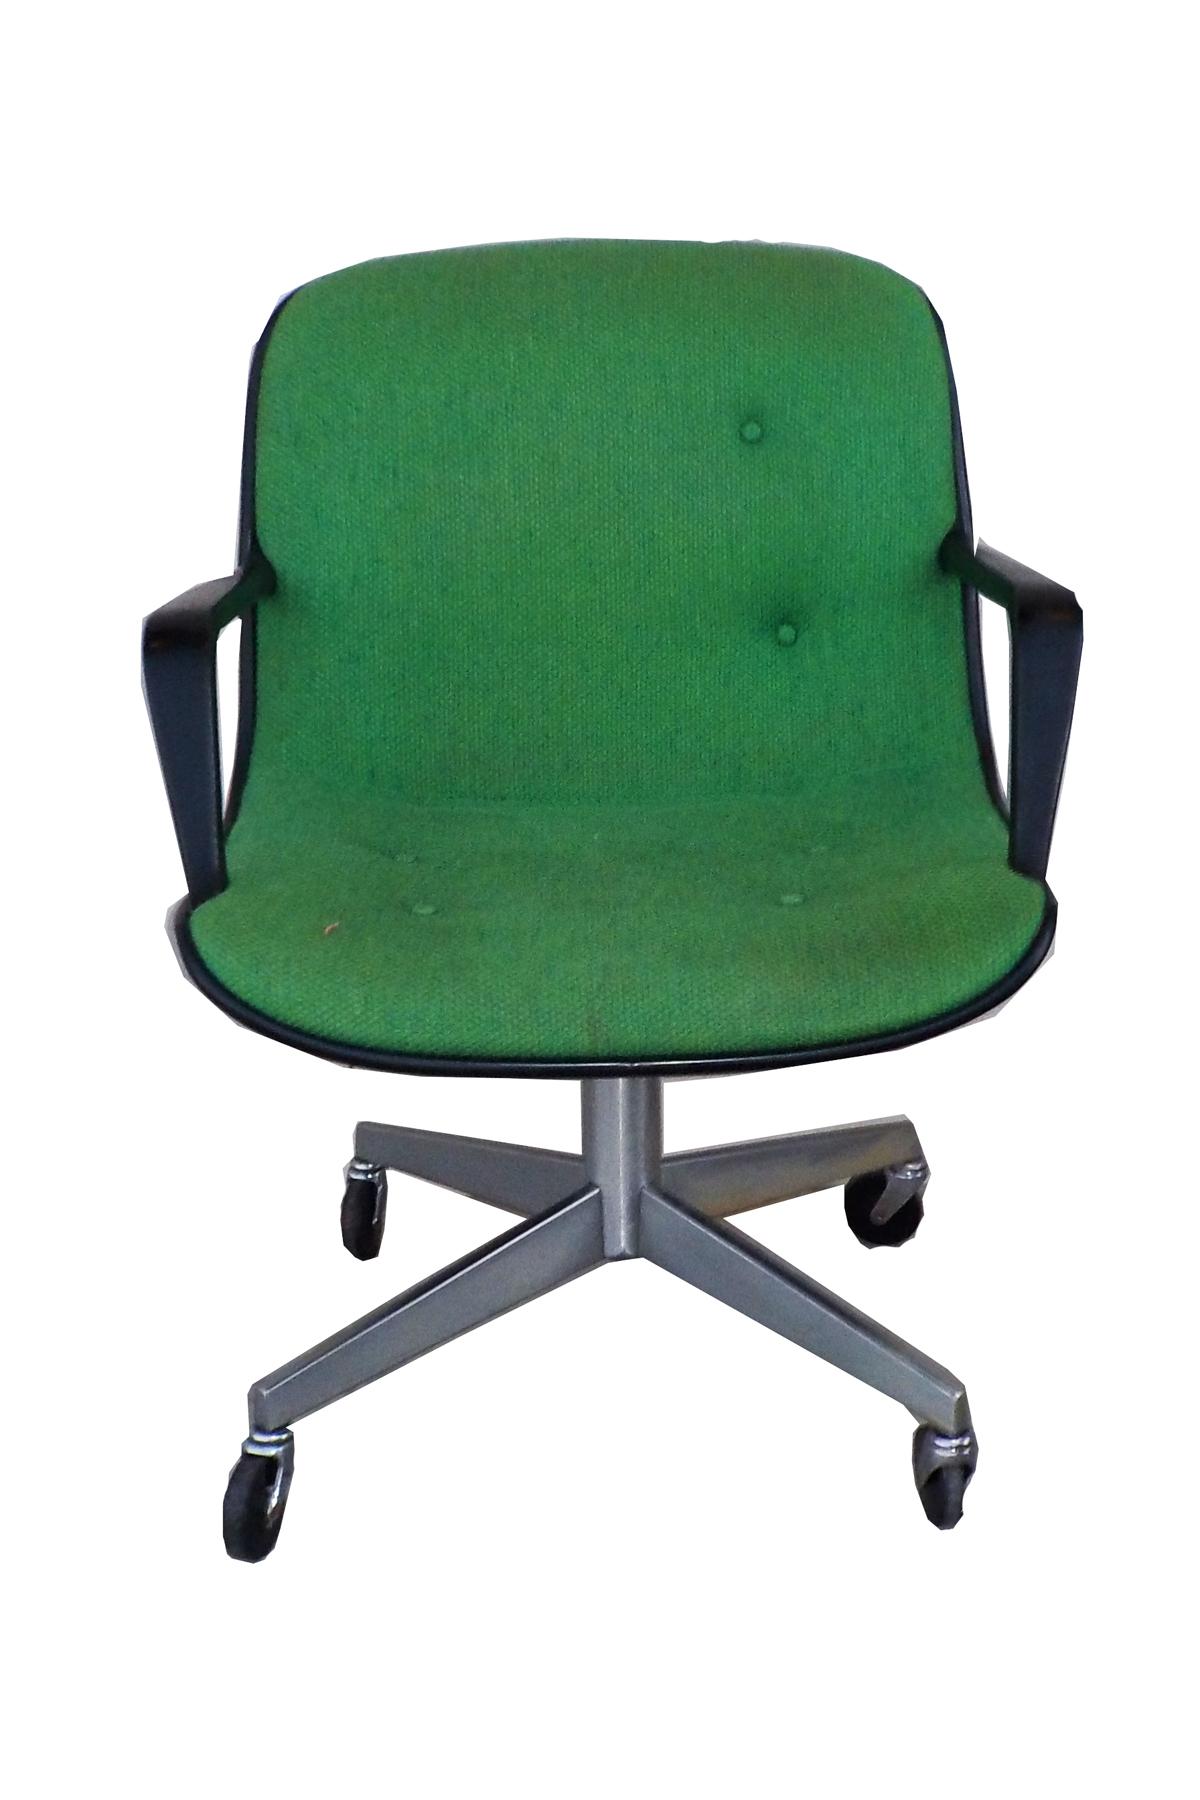 Mid Century Modern SteelCase Vintage Green fice Chair